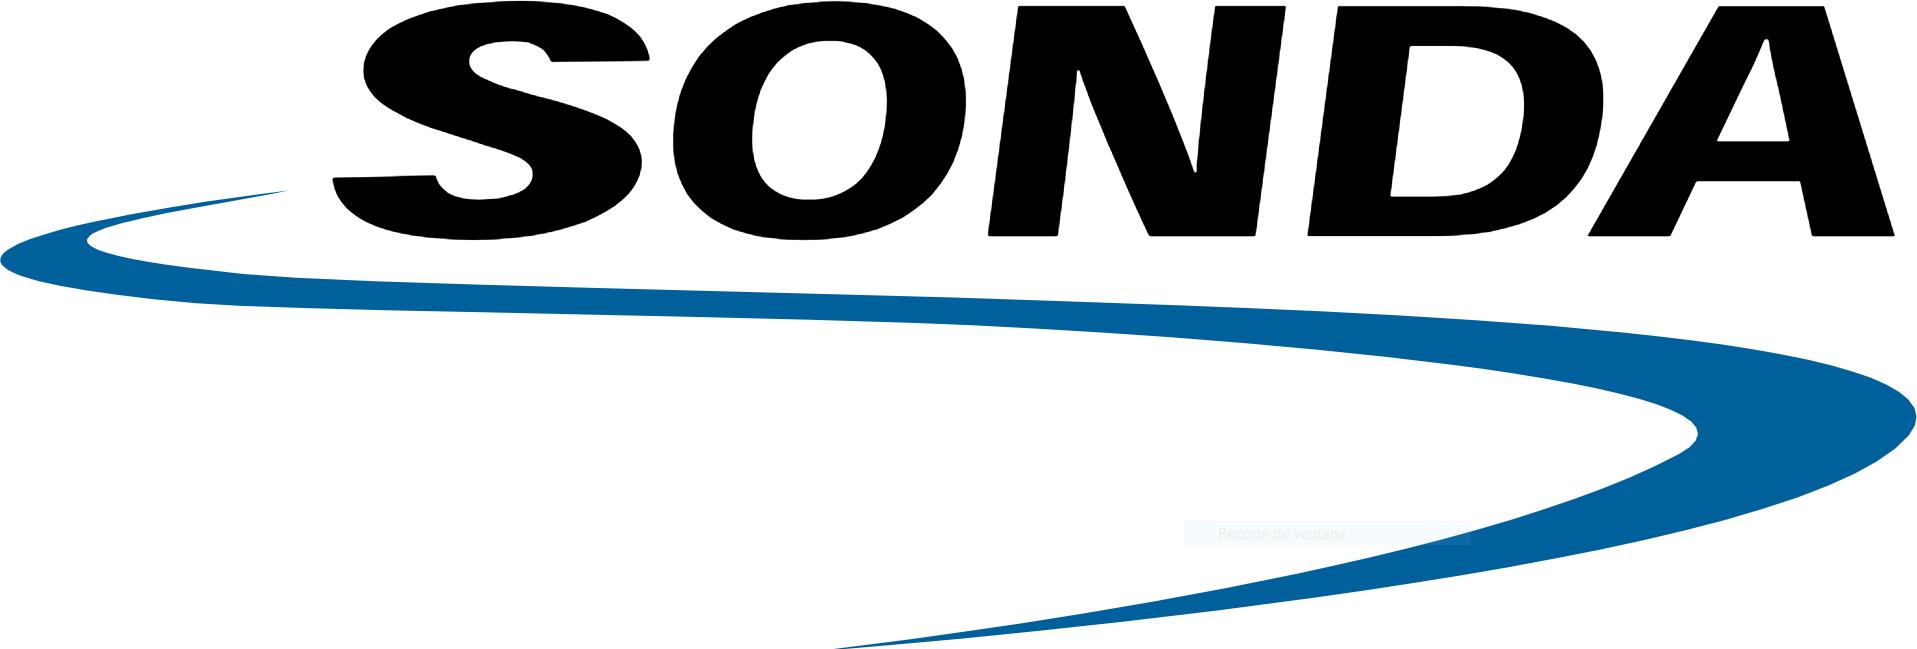 SONDA.PNG